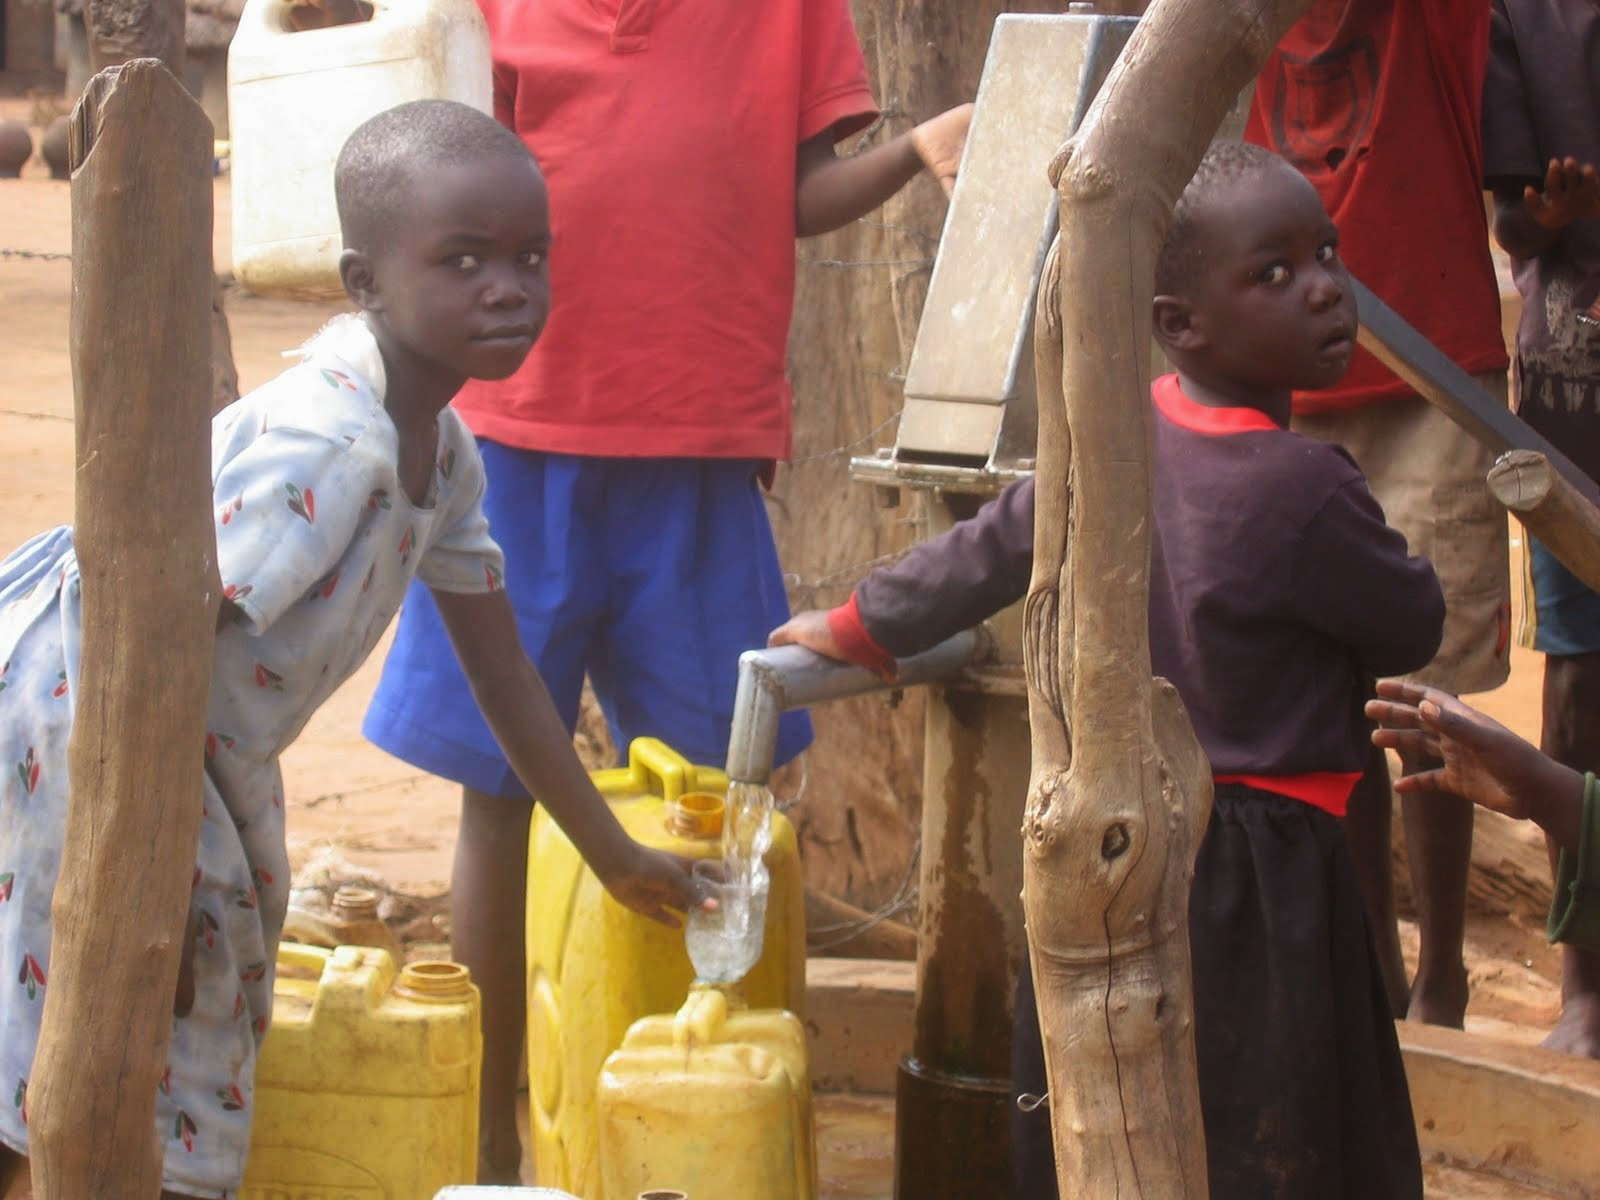 Uganda Pictures Summer 08 184 (1).jpg